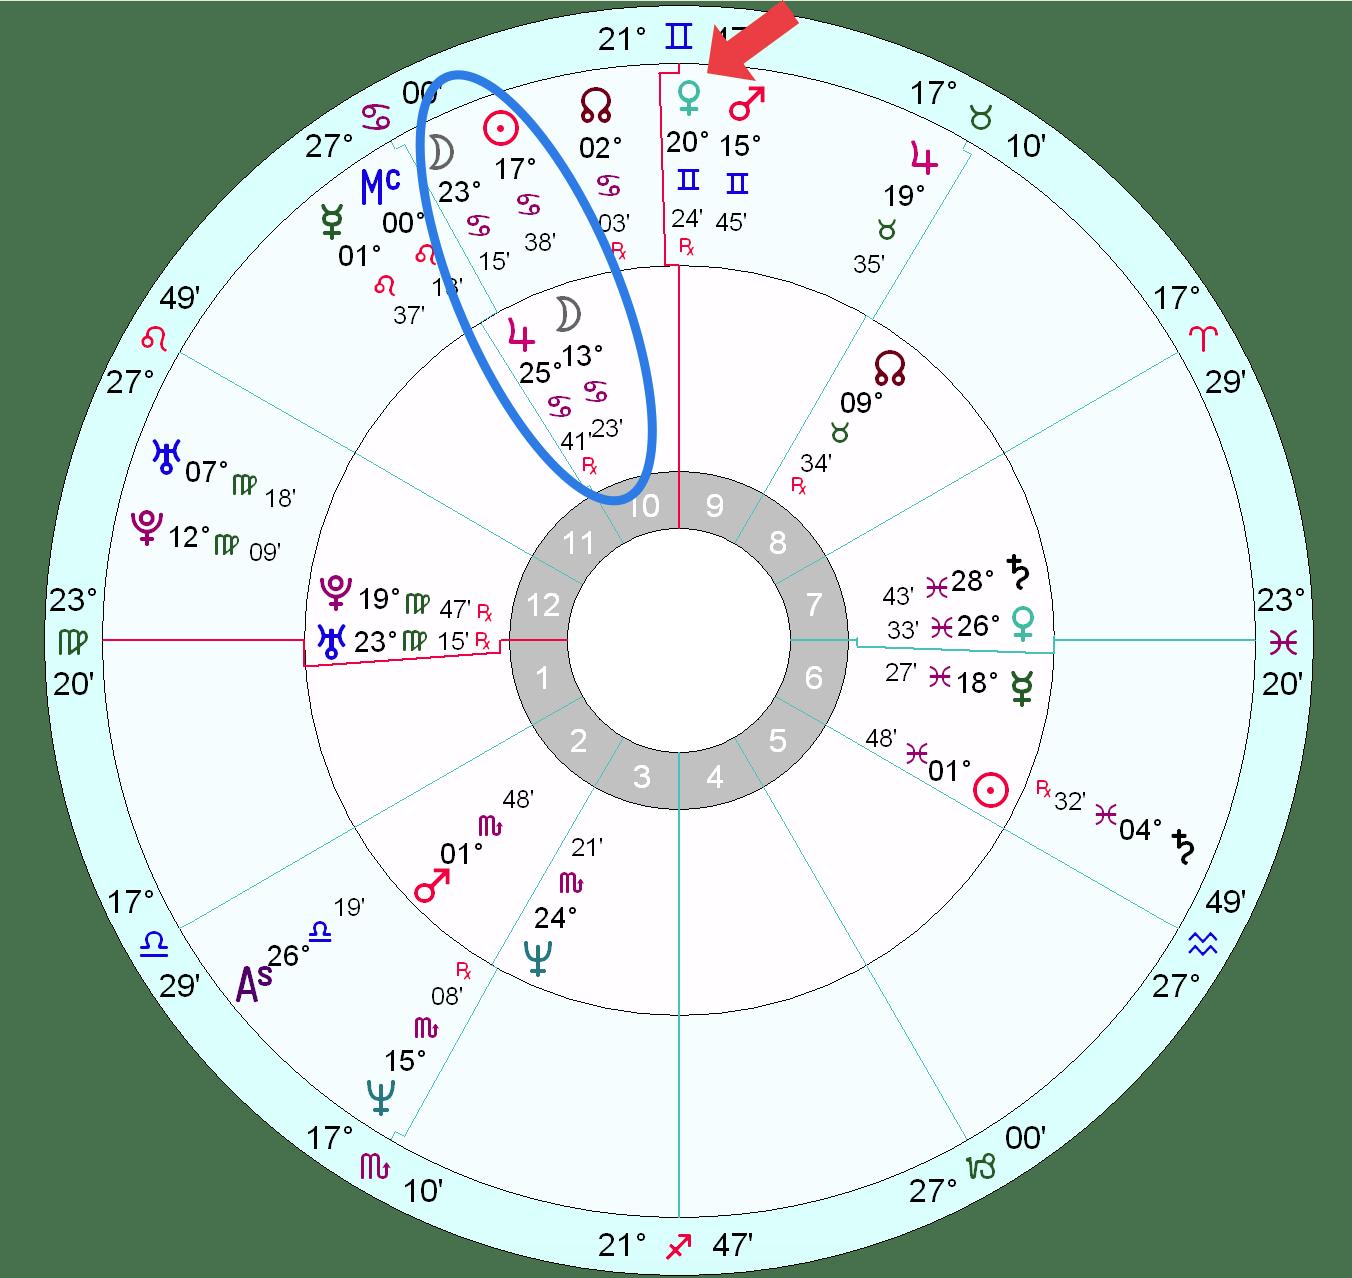 Kurt Cobain's horoscope | Astrology School